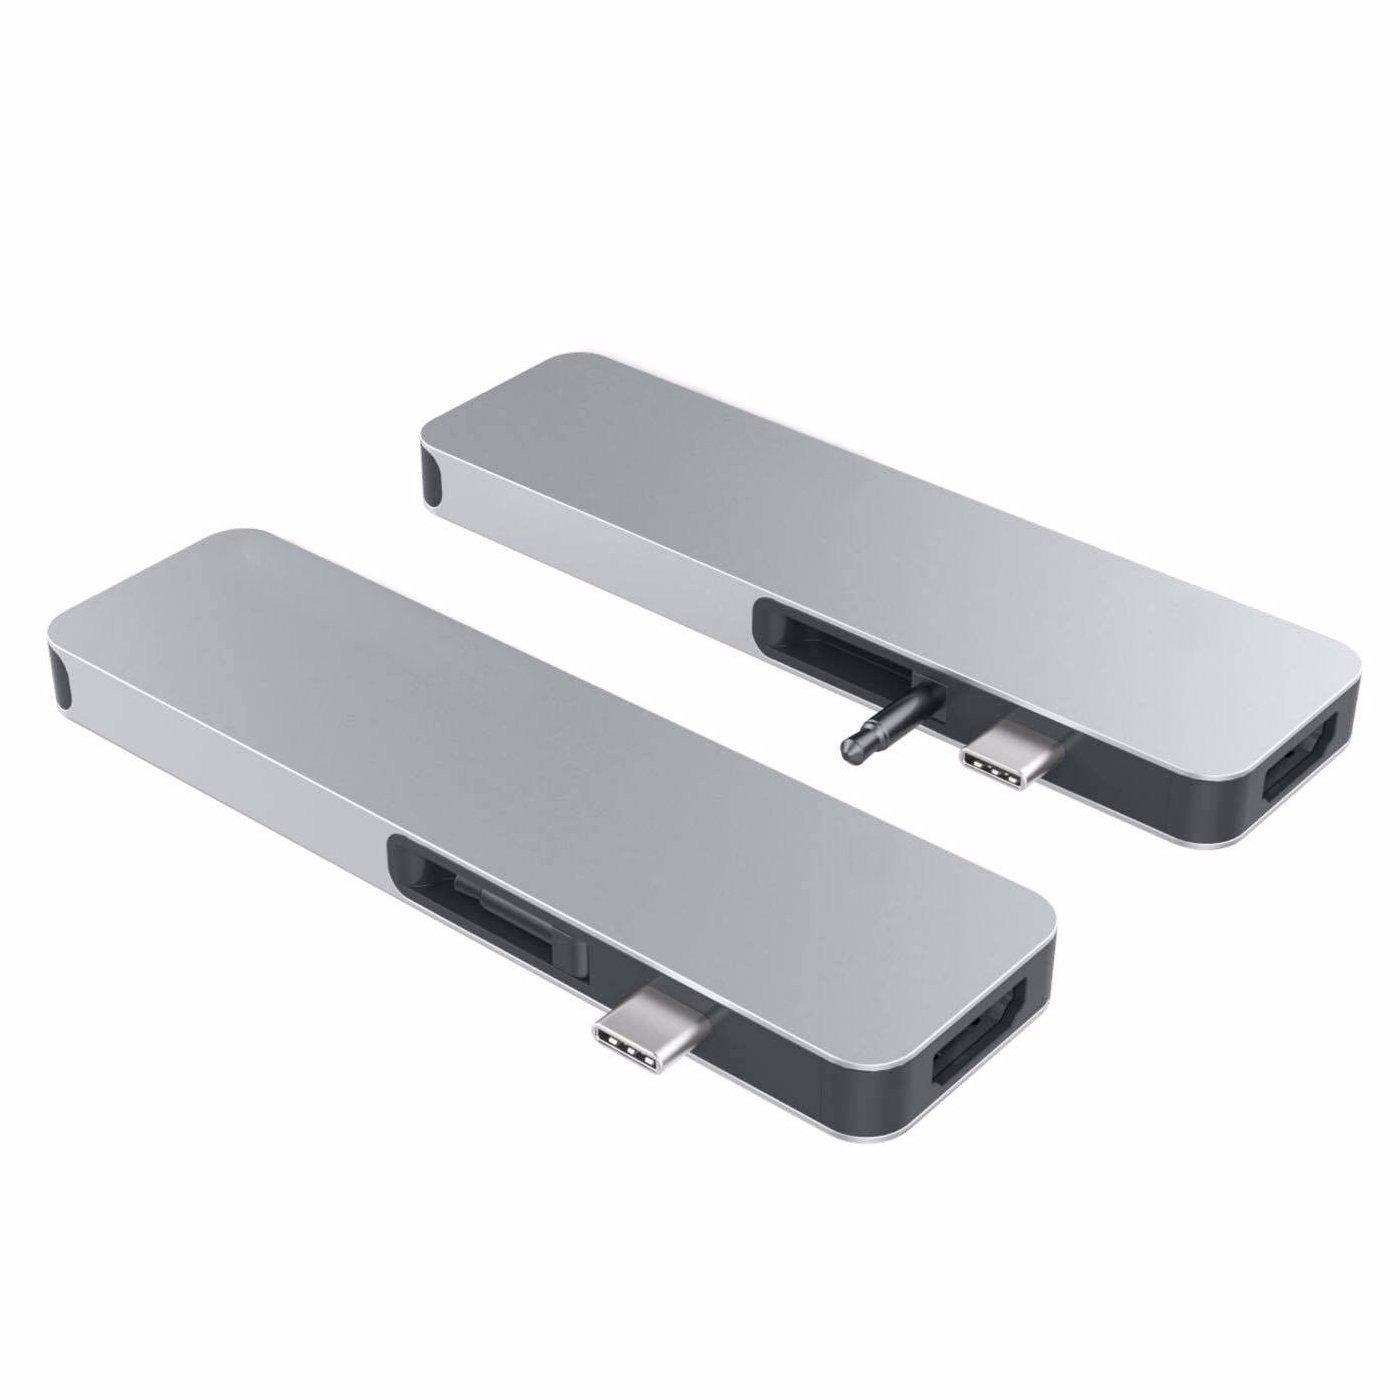 HyperDrive SOLO 7-in-1 USB-C Hub - GN21D